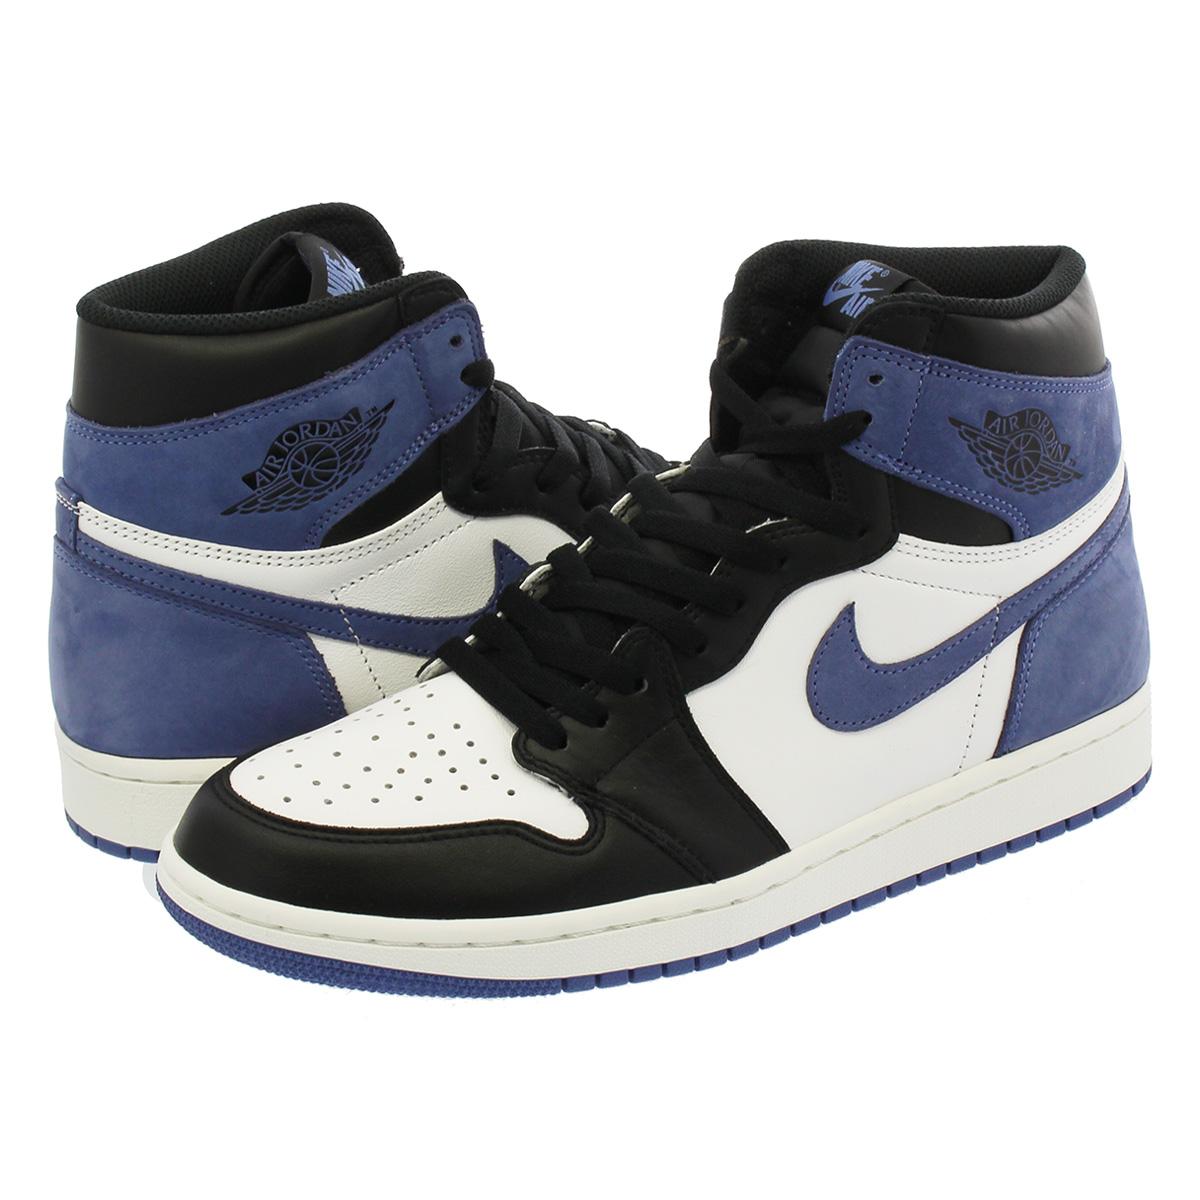 1413e0077fd1 NIKE AIR JORDAN 1 RETRO HIGH OG Nike Air Jordan 1 nostalgic high OG SUMMIT  WHITE BLUE MOON BLACK 555